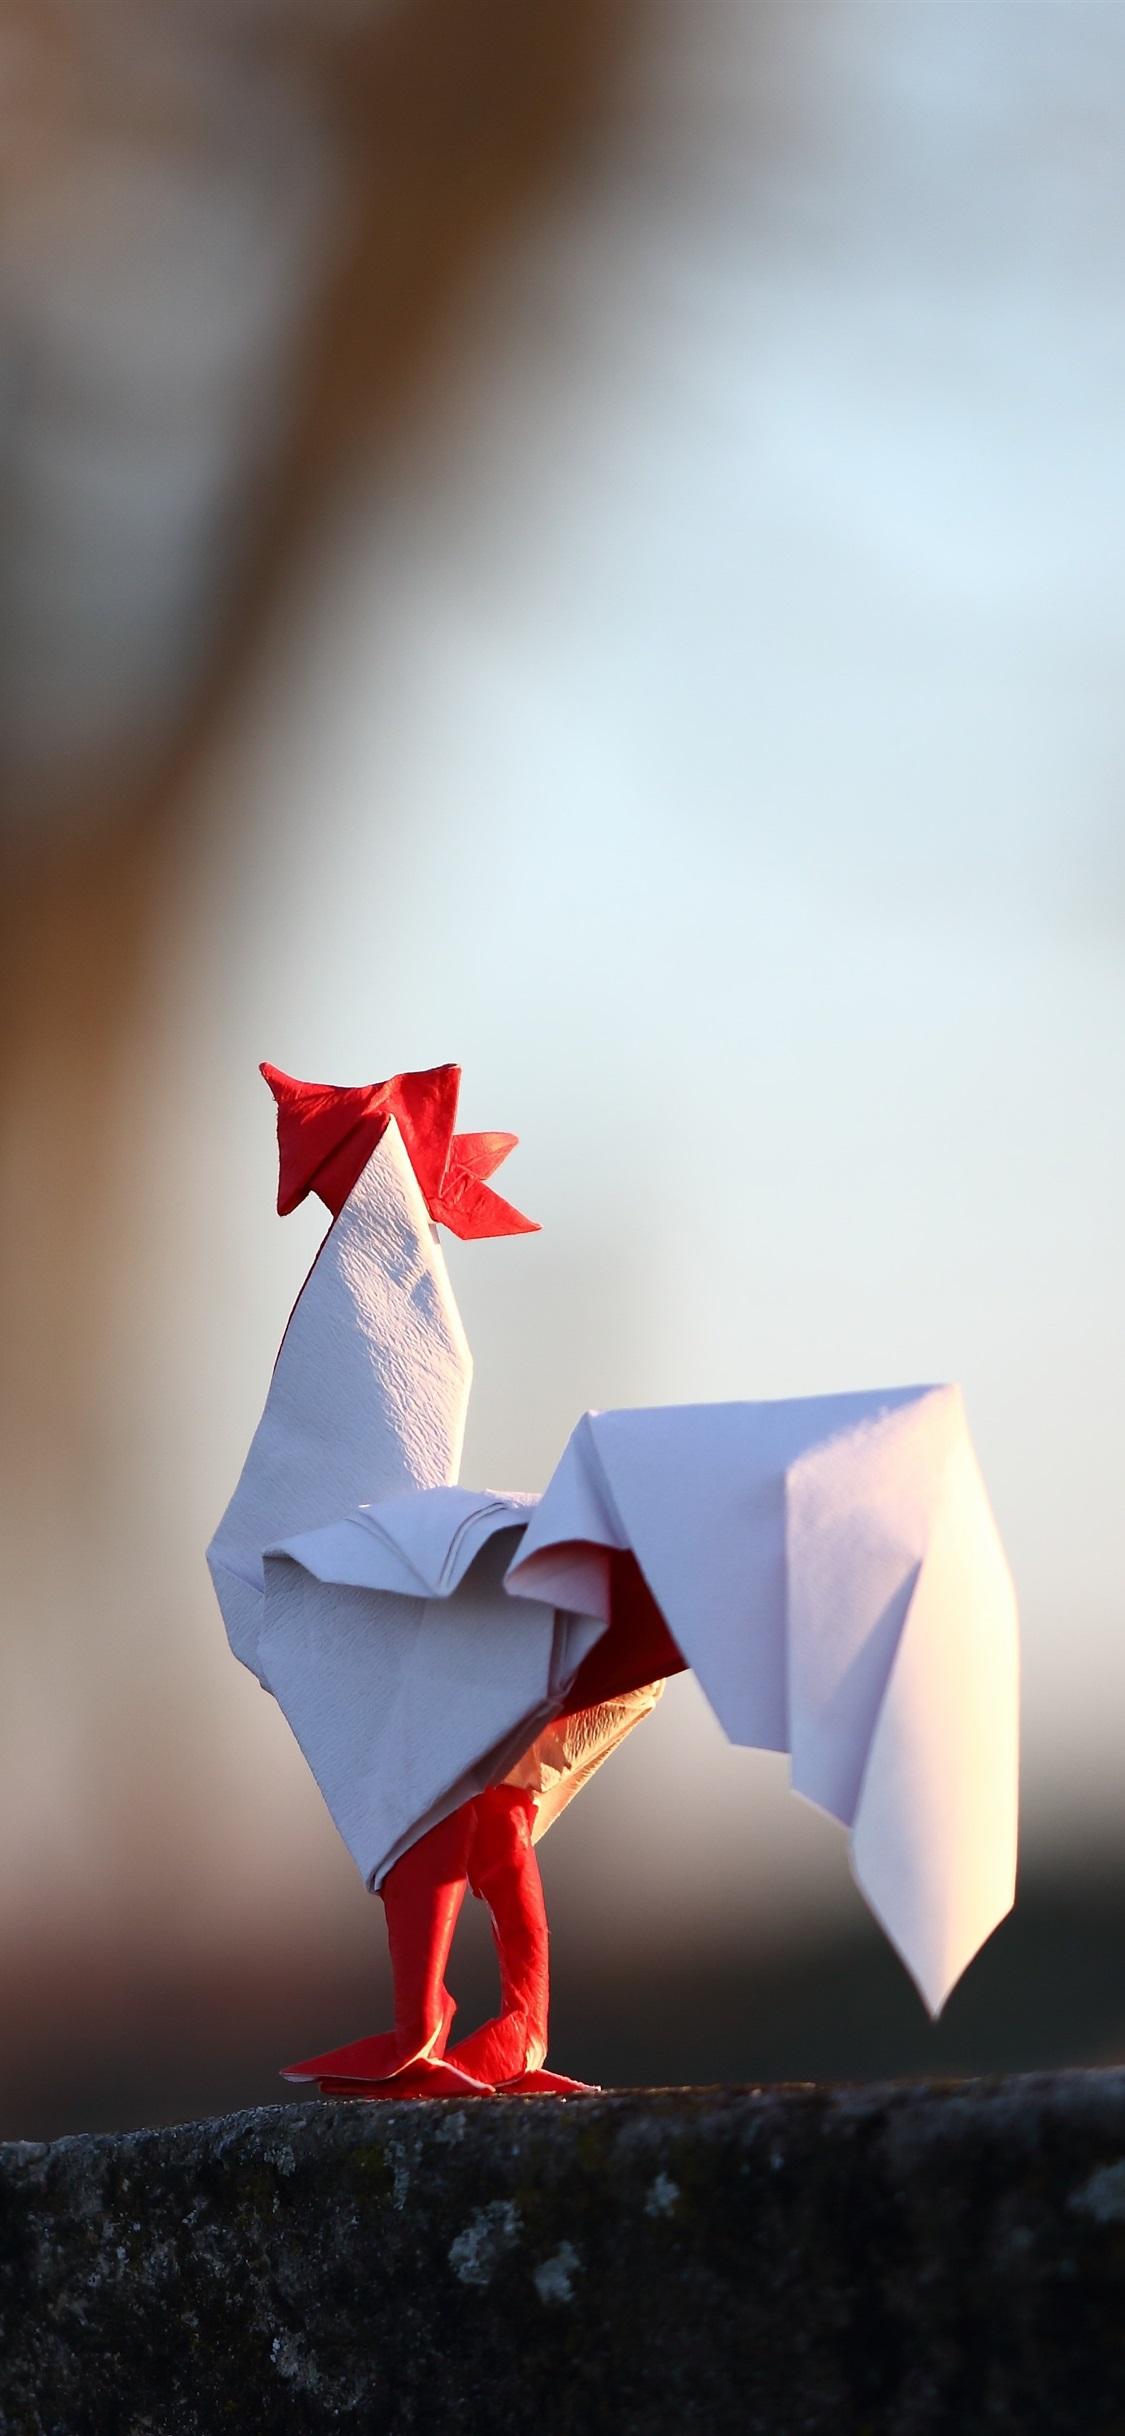 Best 54+ Origami Wallpaper on HipWallpaper   Origami Wallpaper ...   2436x1125